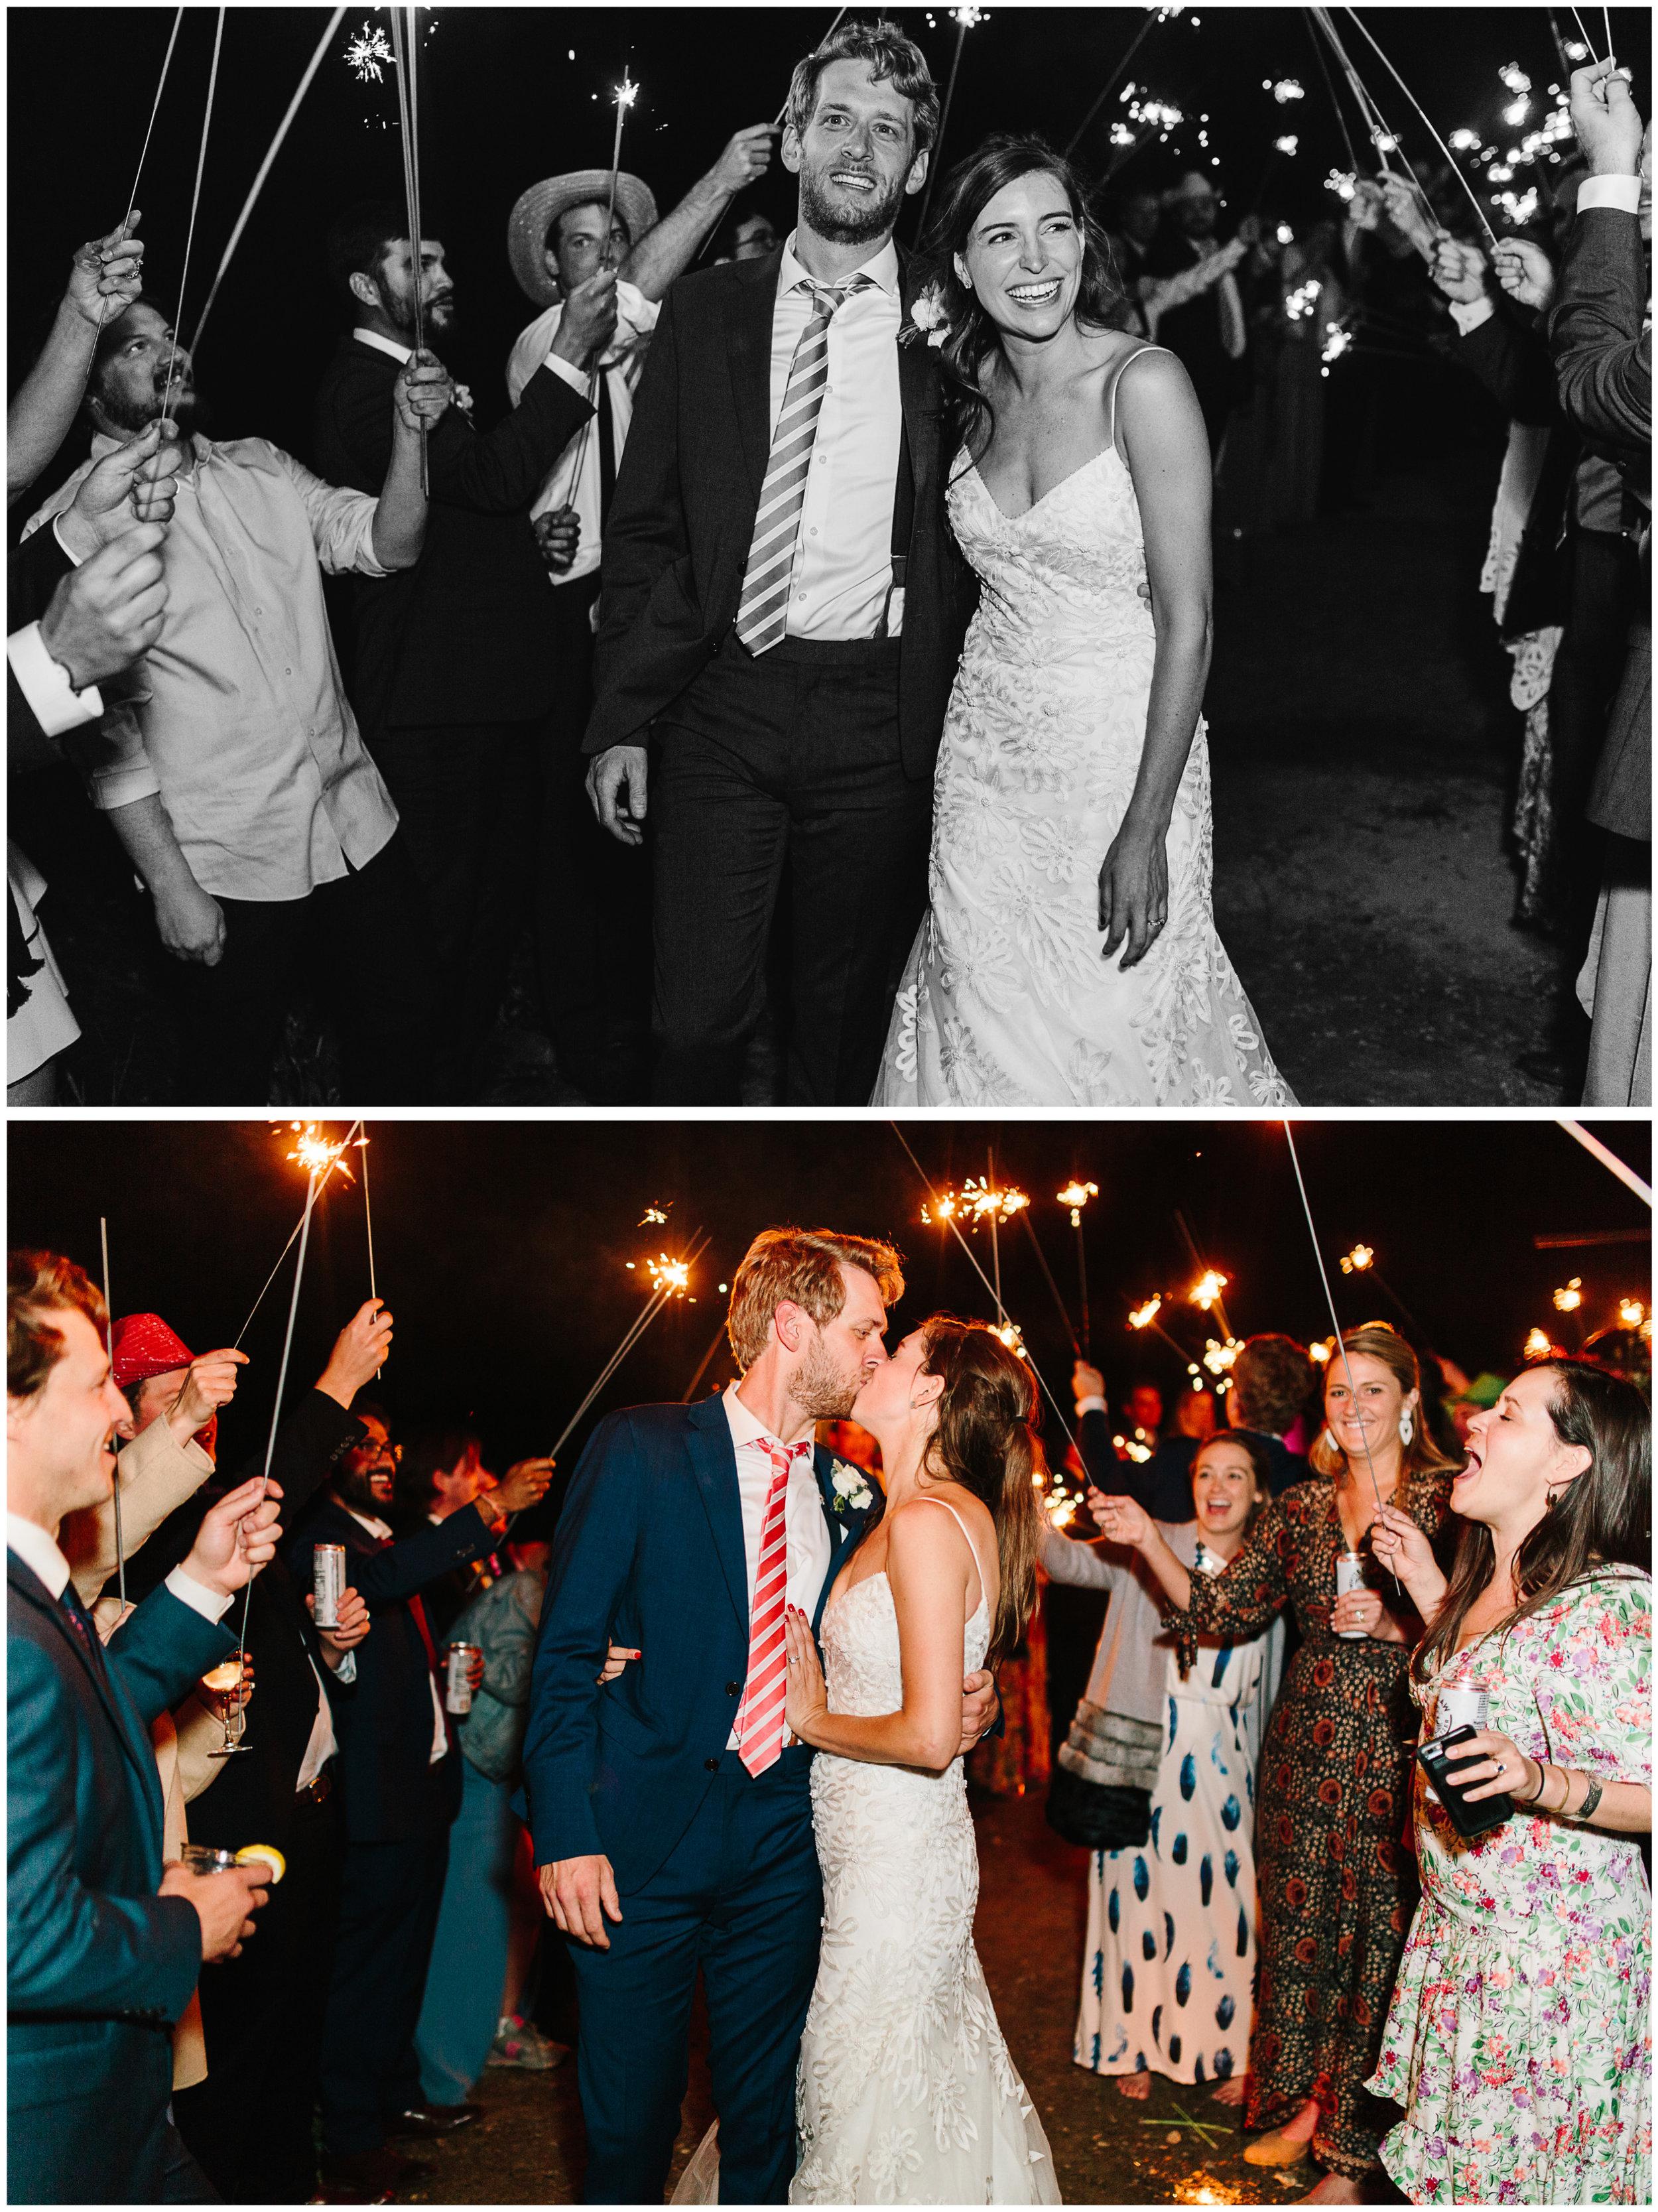 crested_butte_wedding_161.jpg